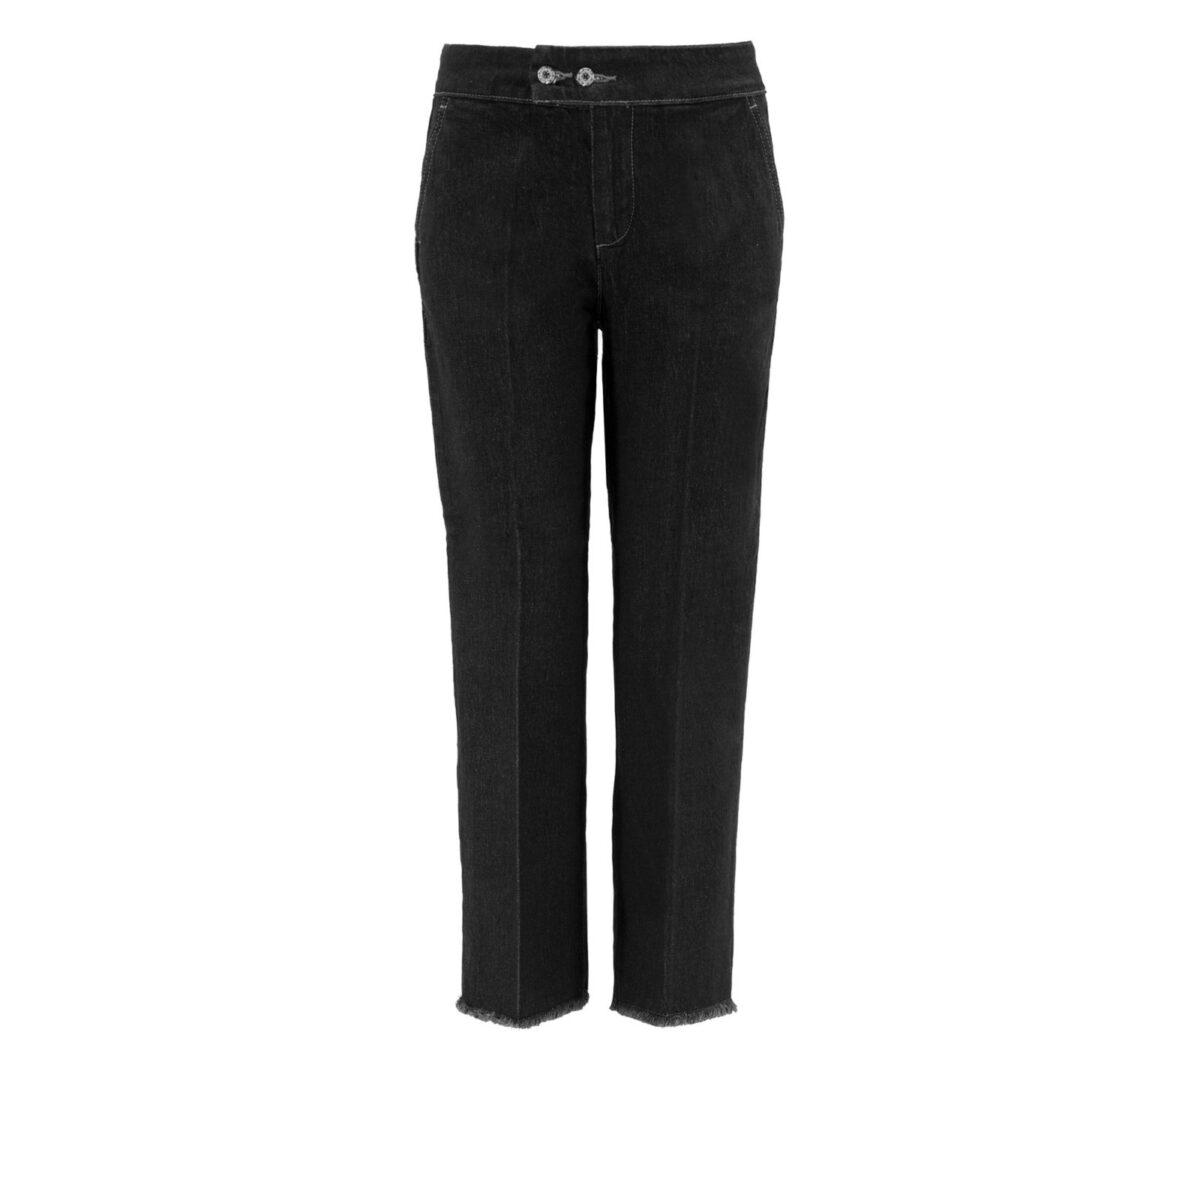 Pantalone Classic in denim DENIM - vista frontale   Nicla